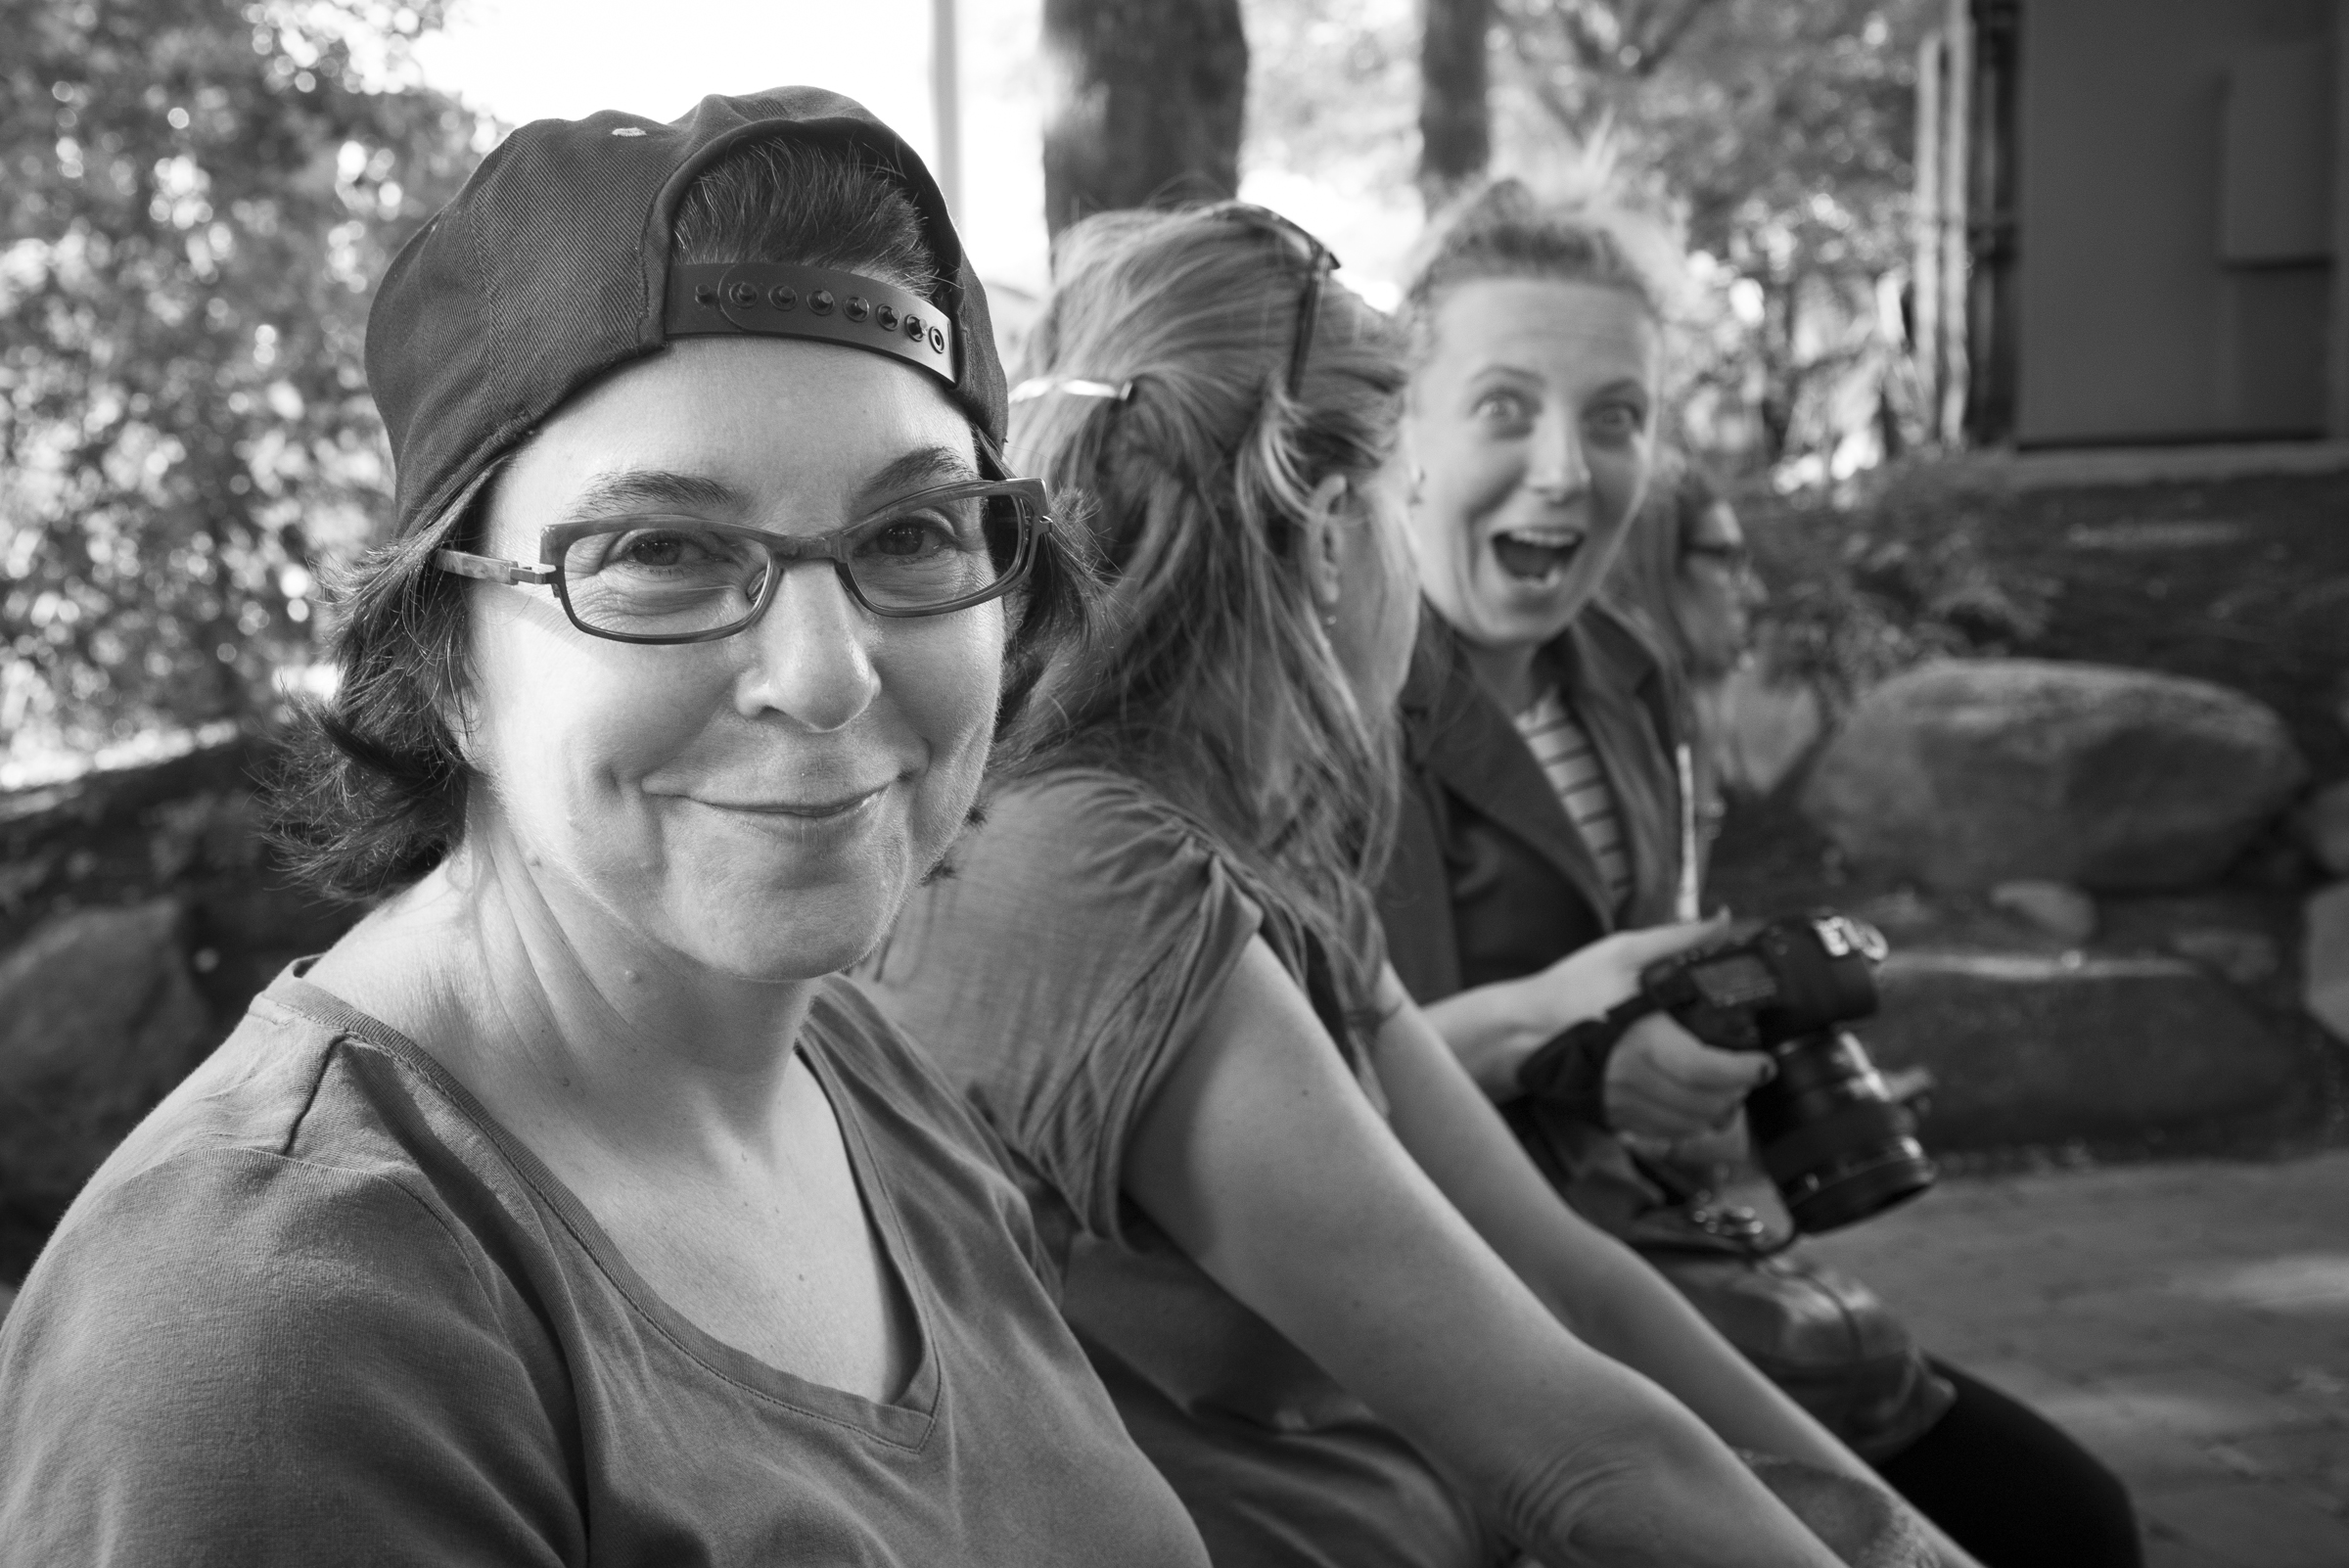 08252013-CarnivalScene-JuliaLuckettPhotography-18